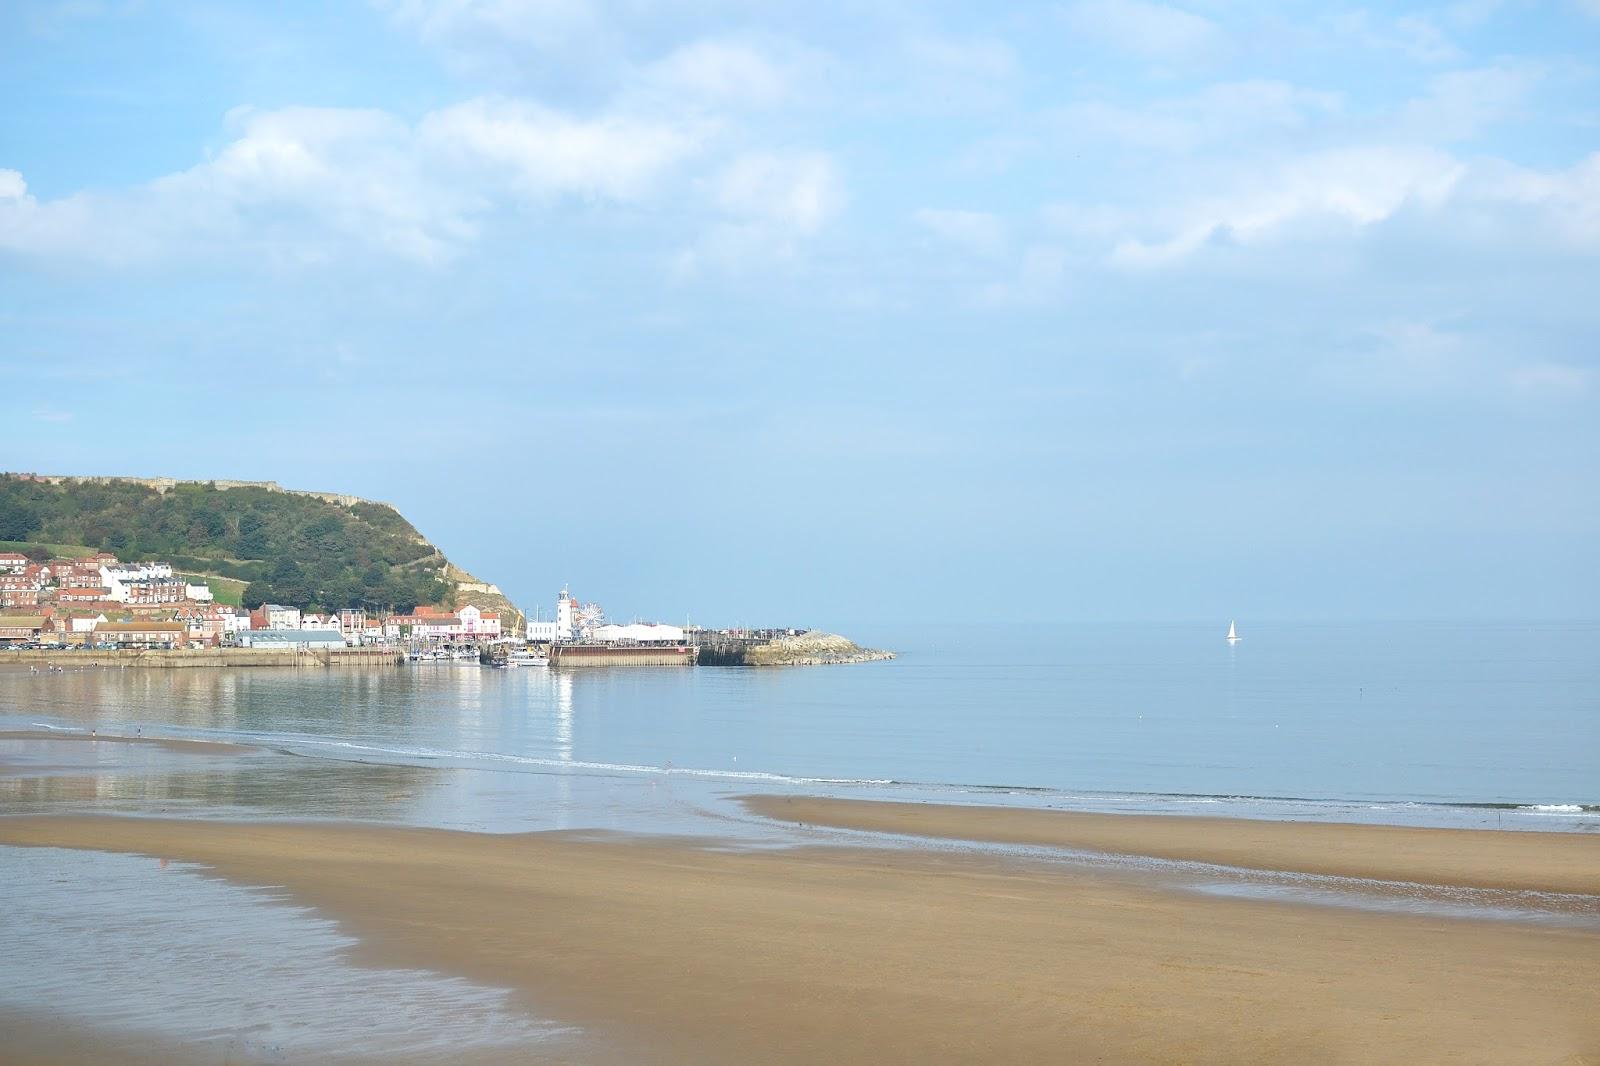 Scarborough beach, coastal towns, seaside town, british seaside